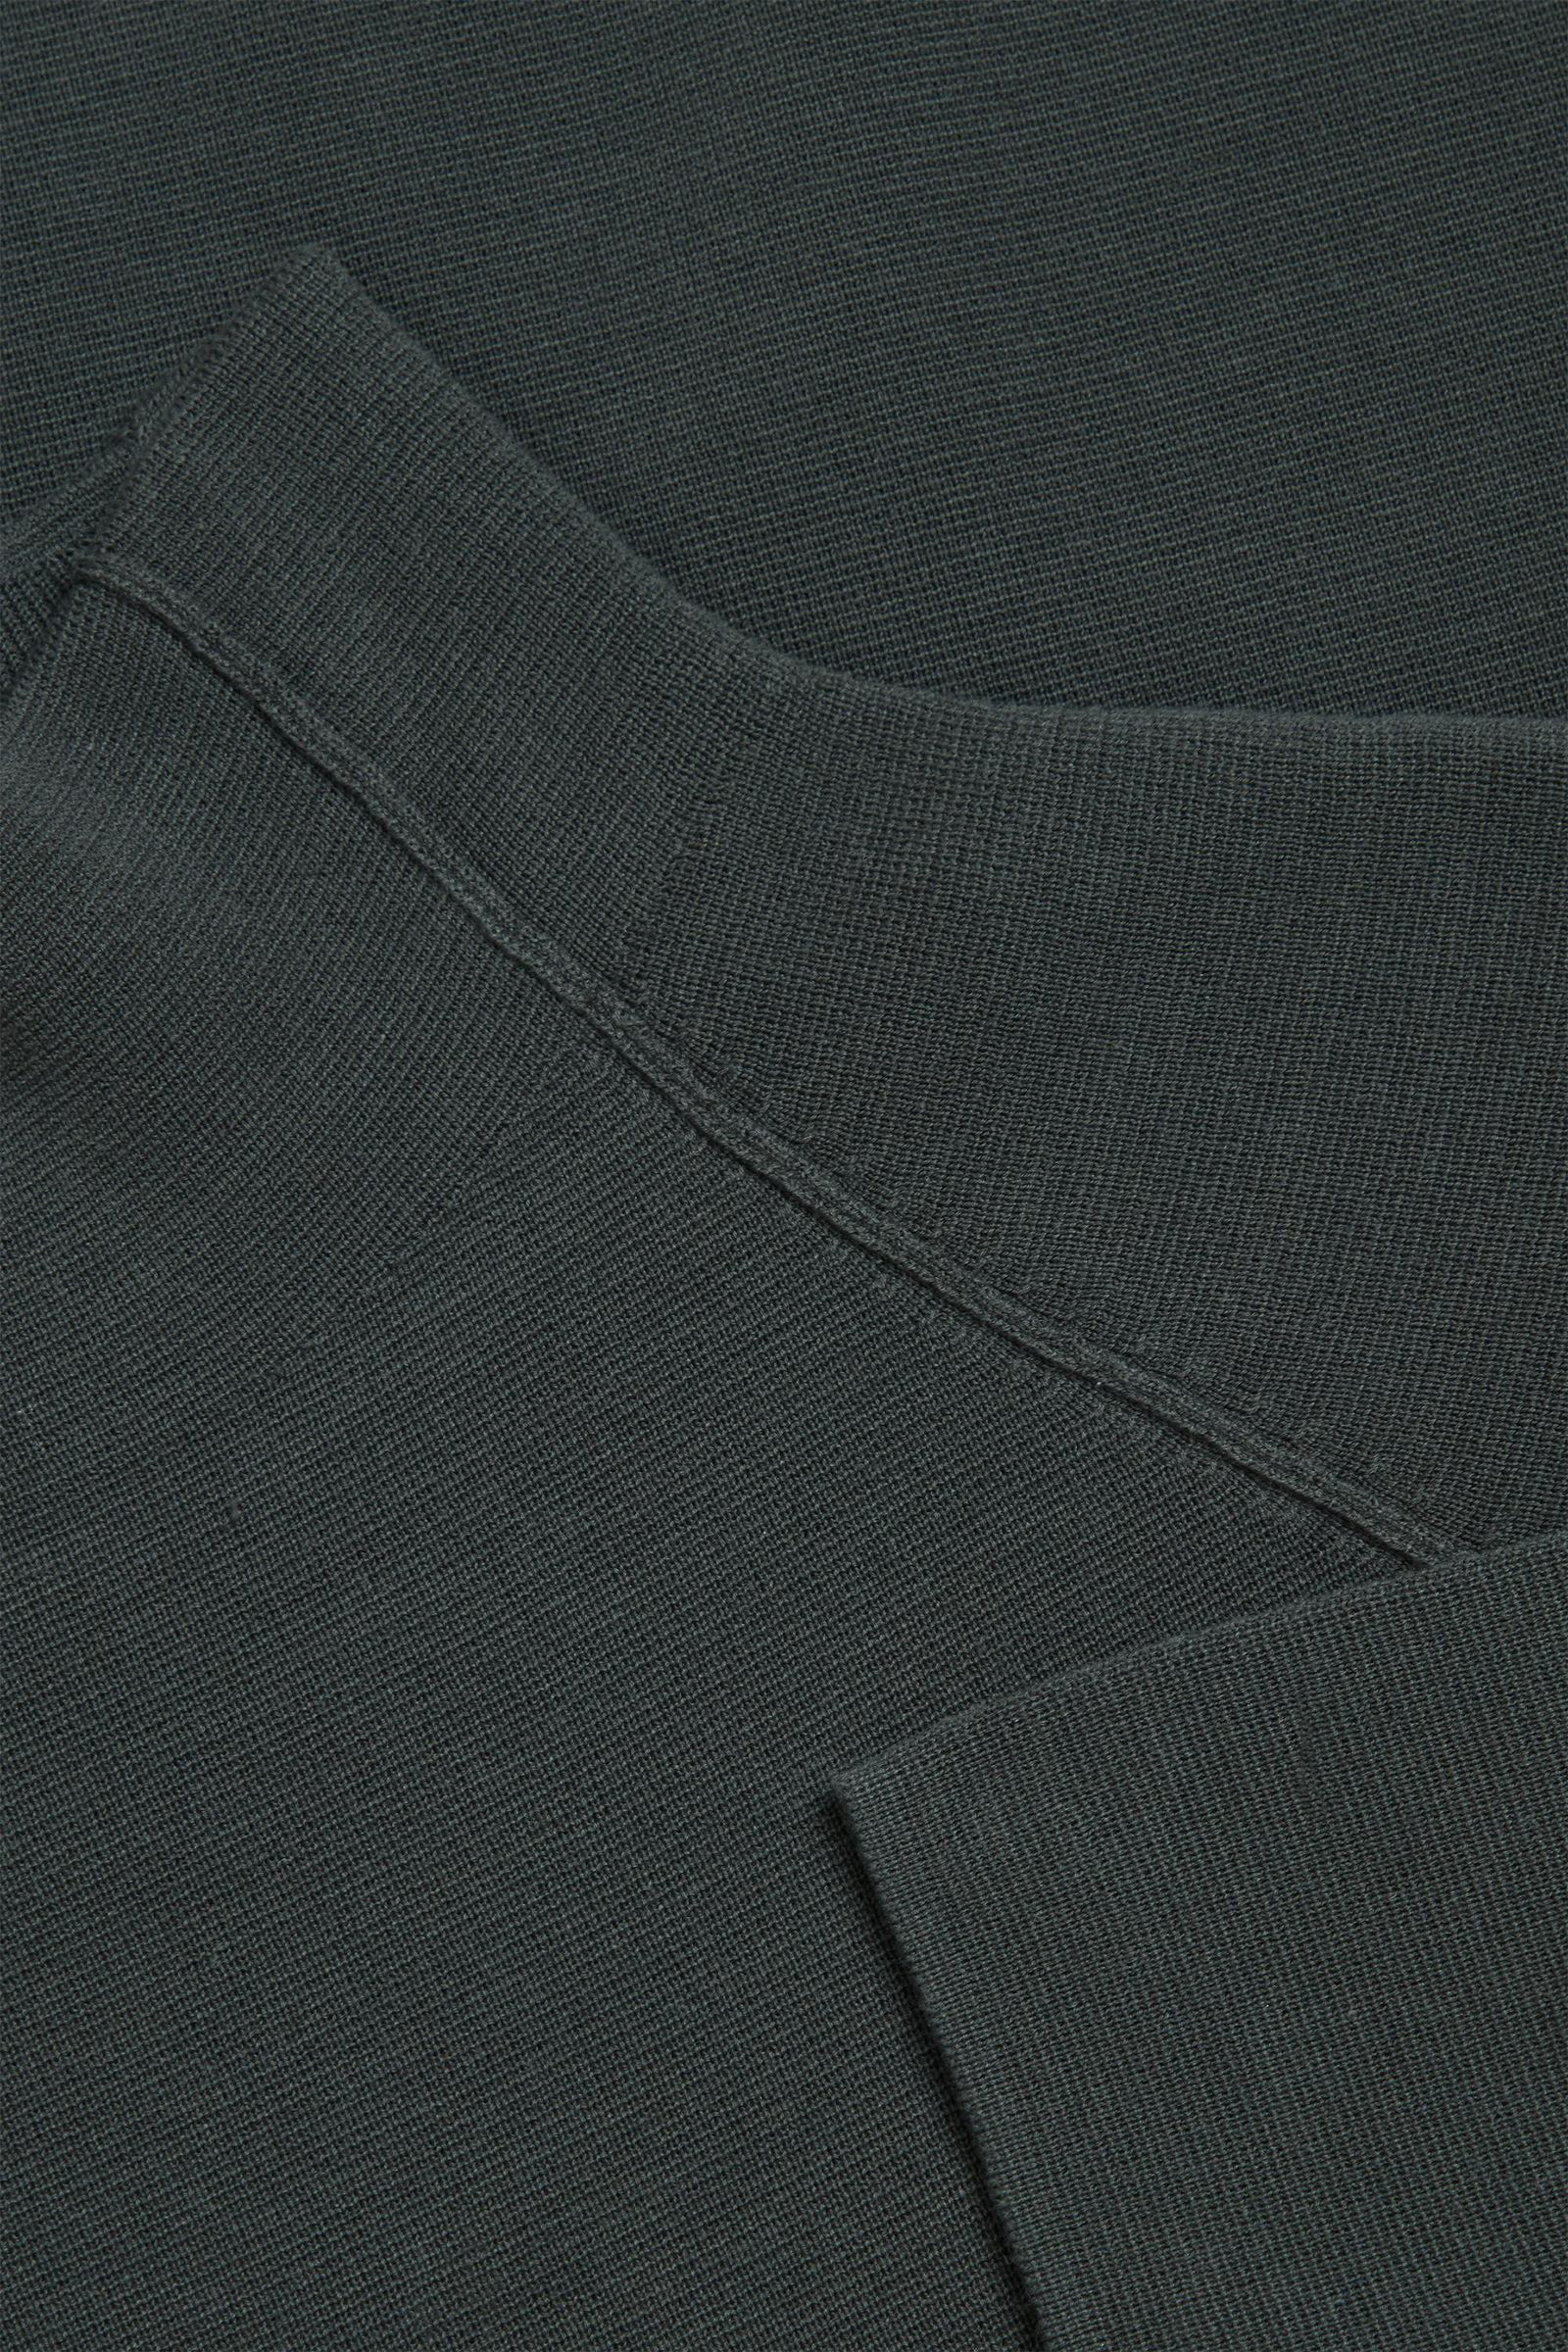 COS 폴로 넥 오가닉 코튼 스웨터의 그레이컬러 Detail입니다.